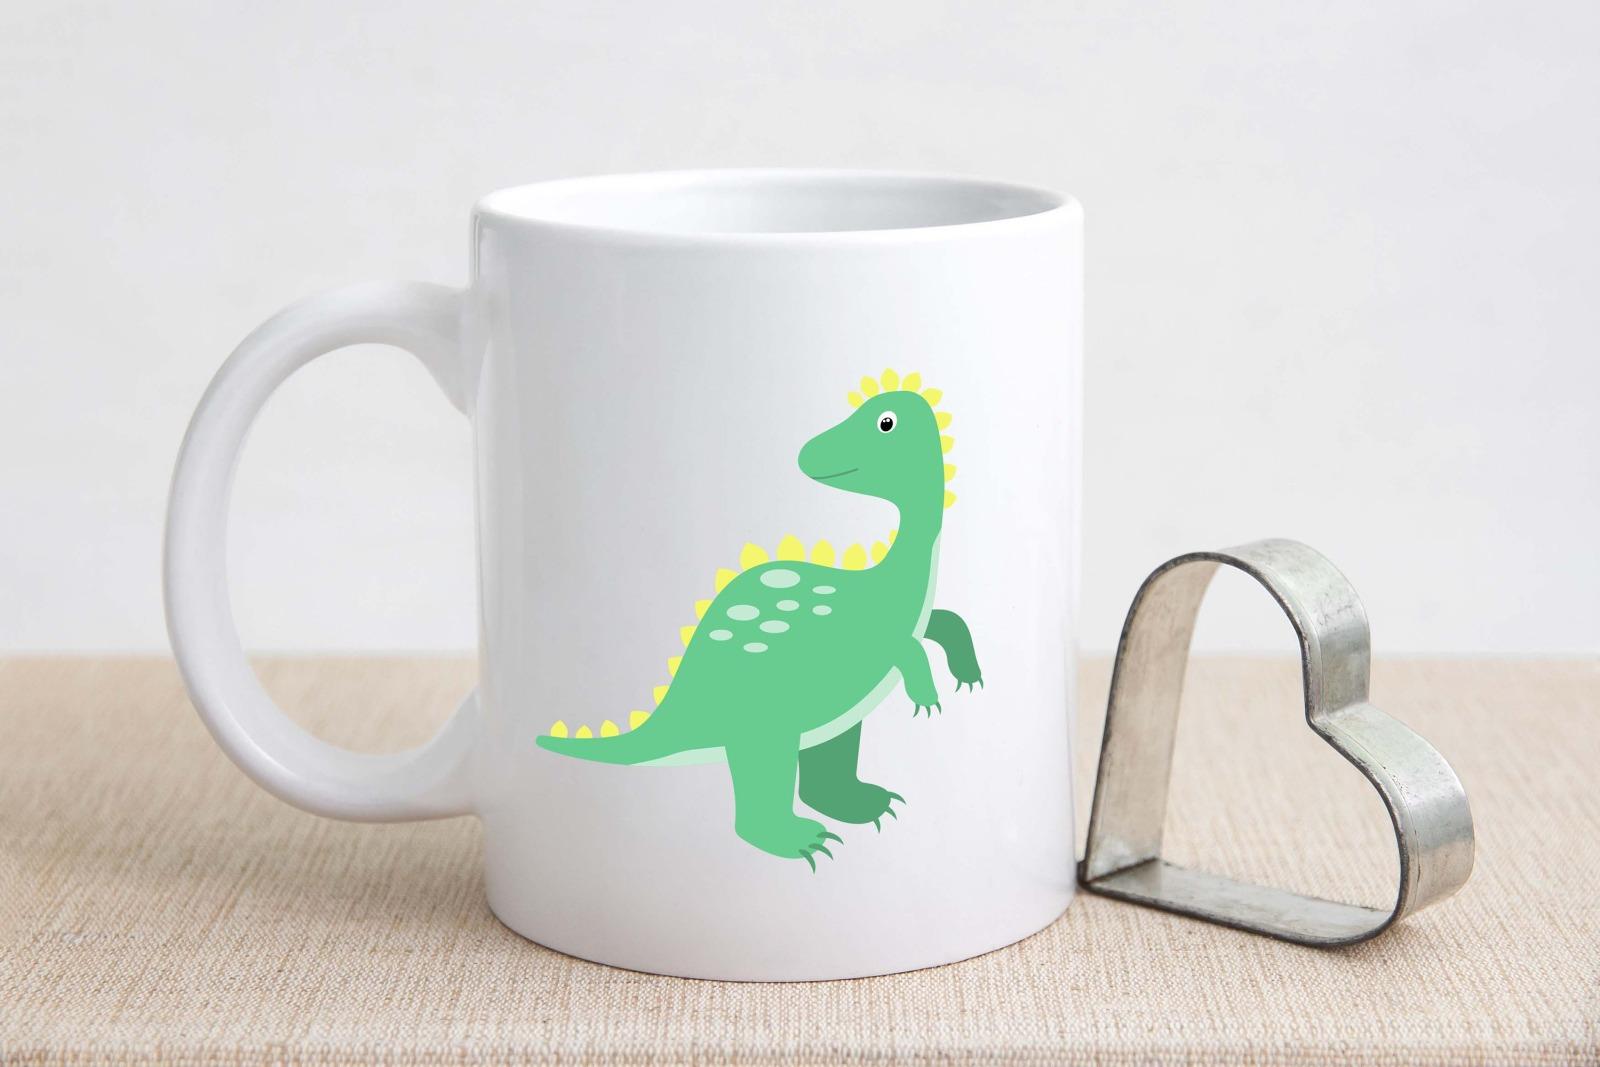 Tasse Dinosaurier-Look personalisiert mit Wunschname 2